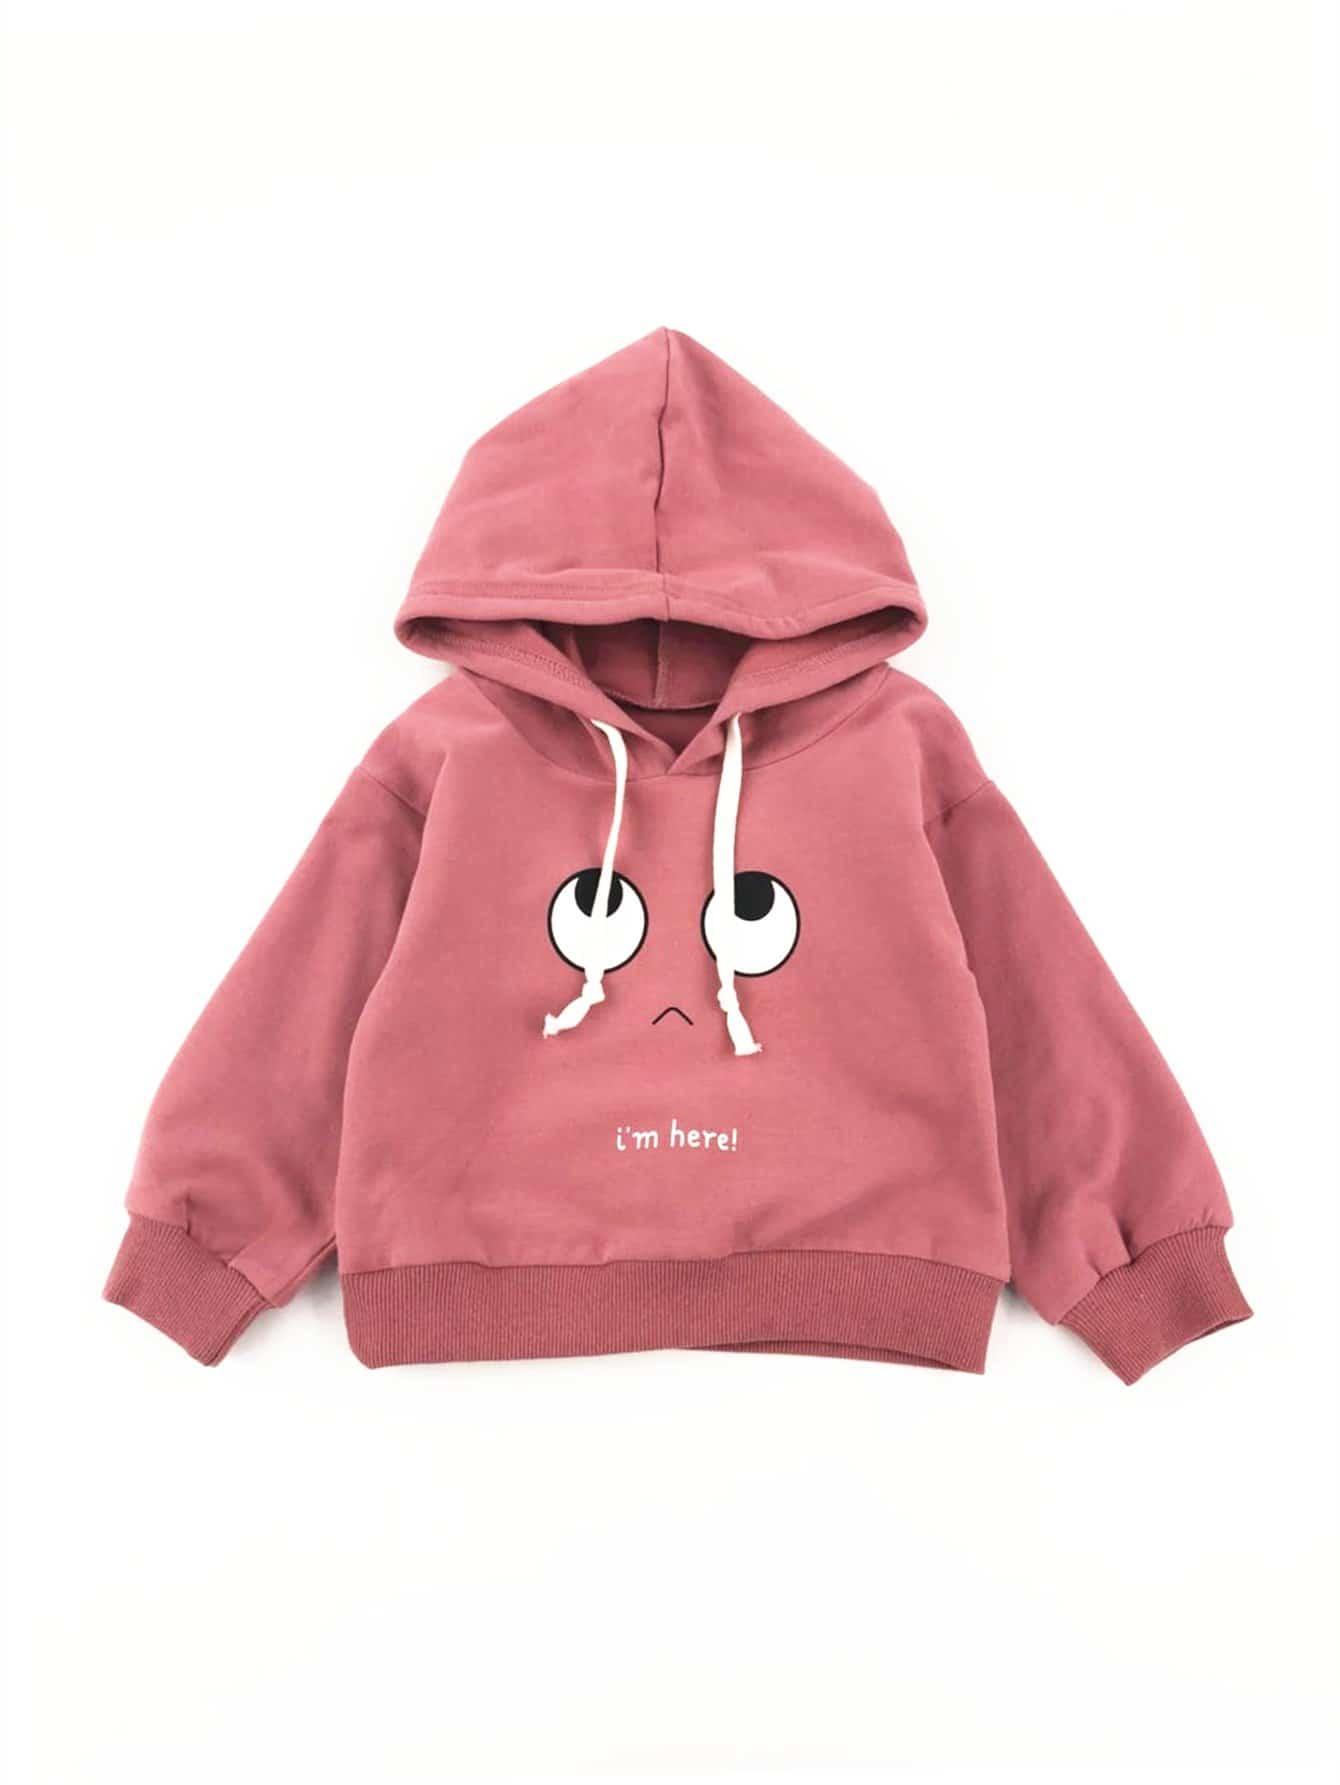 Girls Cartoon Print Hooded Sweatshirt